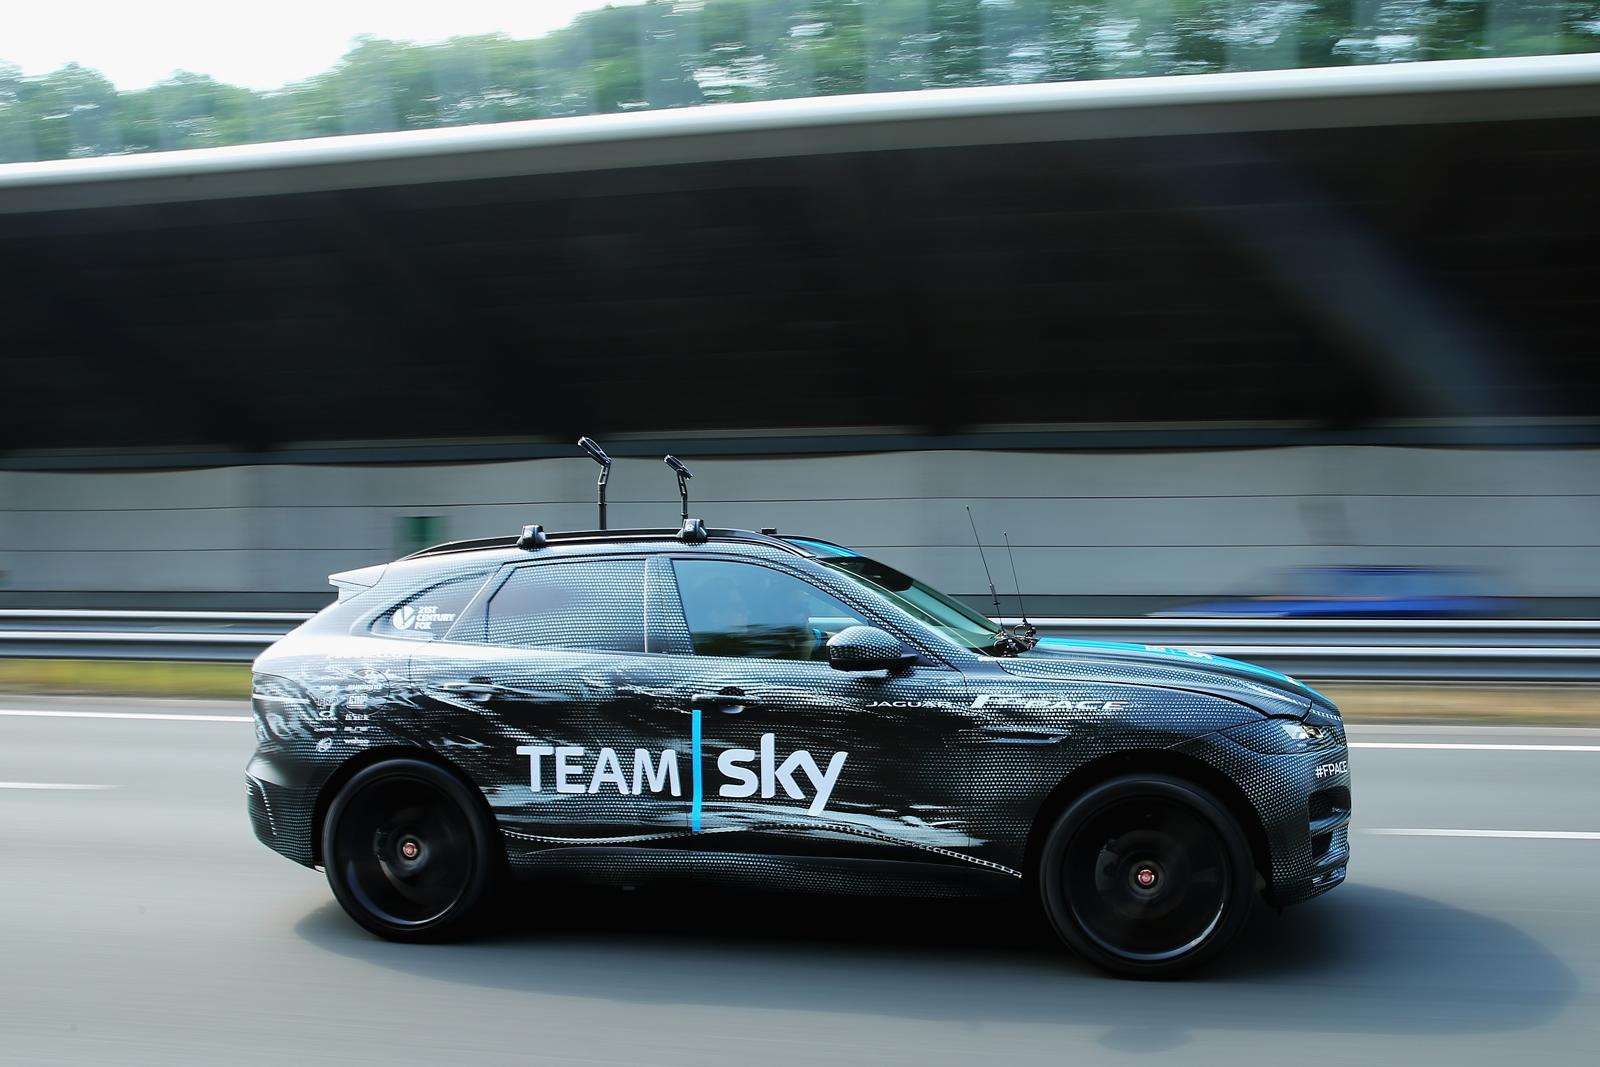 jaguar cars news jaguar f pace breaks cover at tour de france. Black Bedroom Furniture Sets. Home Design Ideas